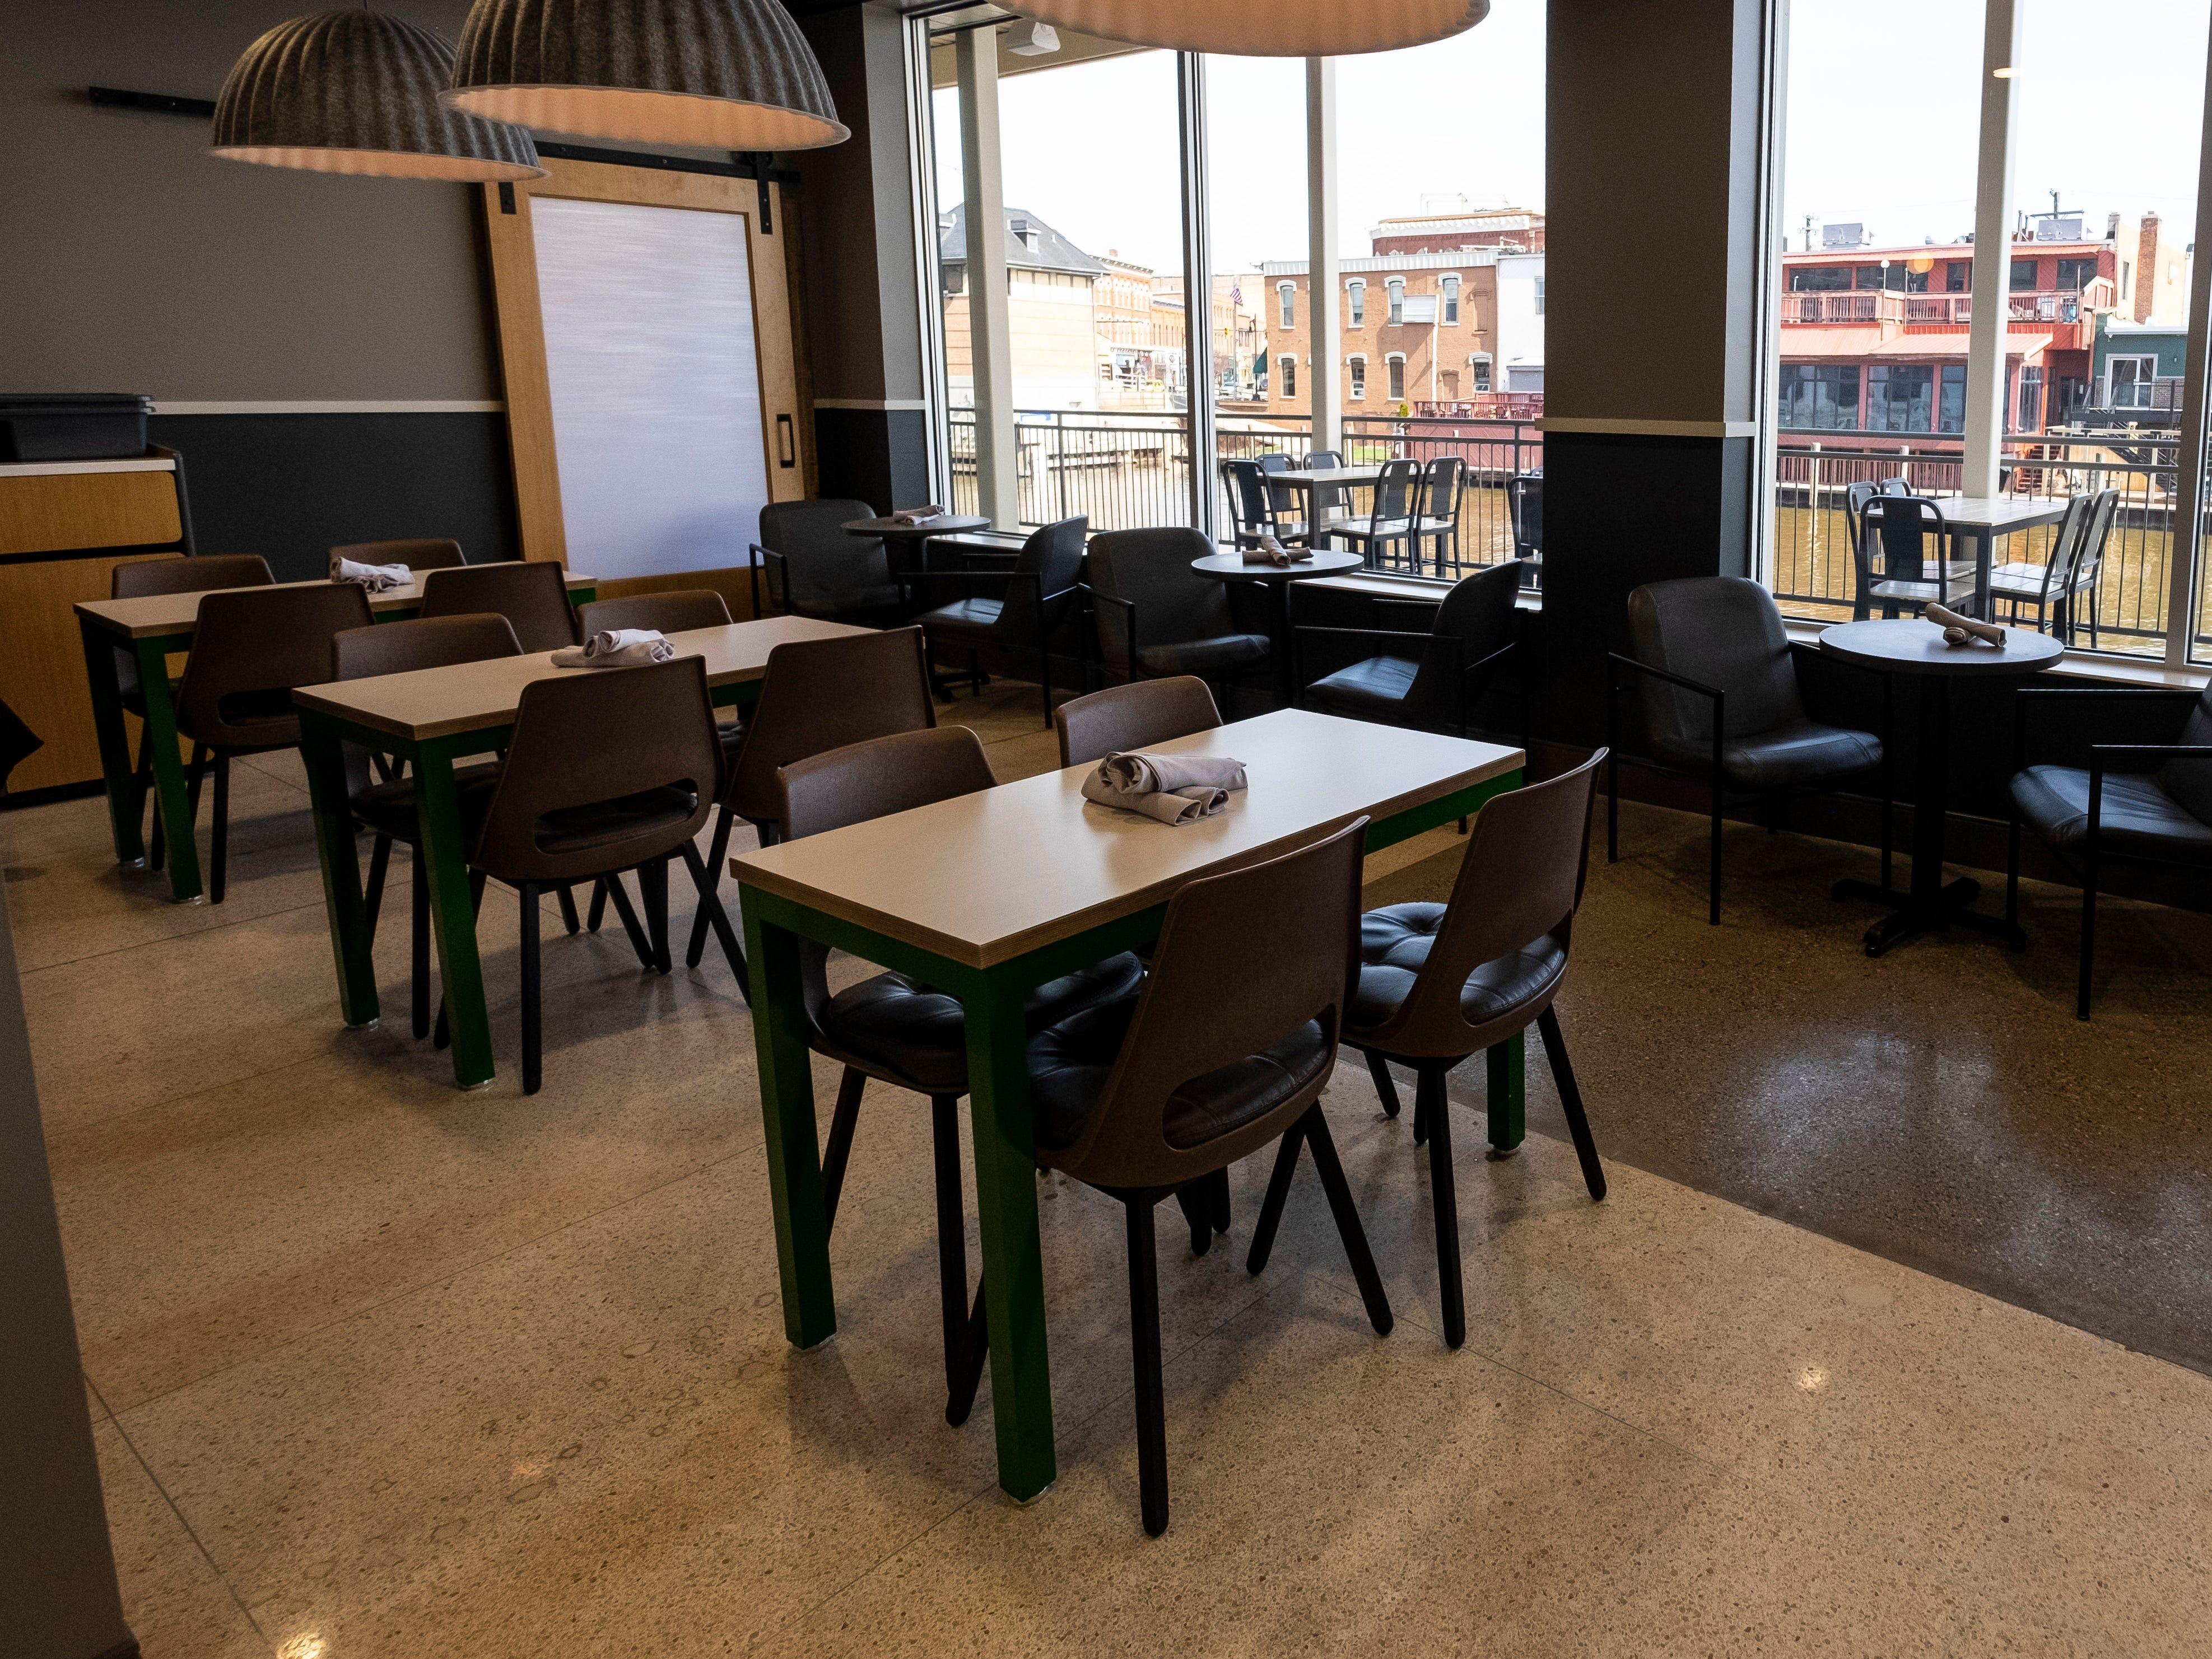 TheKitchen opened inside CityFlats Hotel last fall.